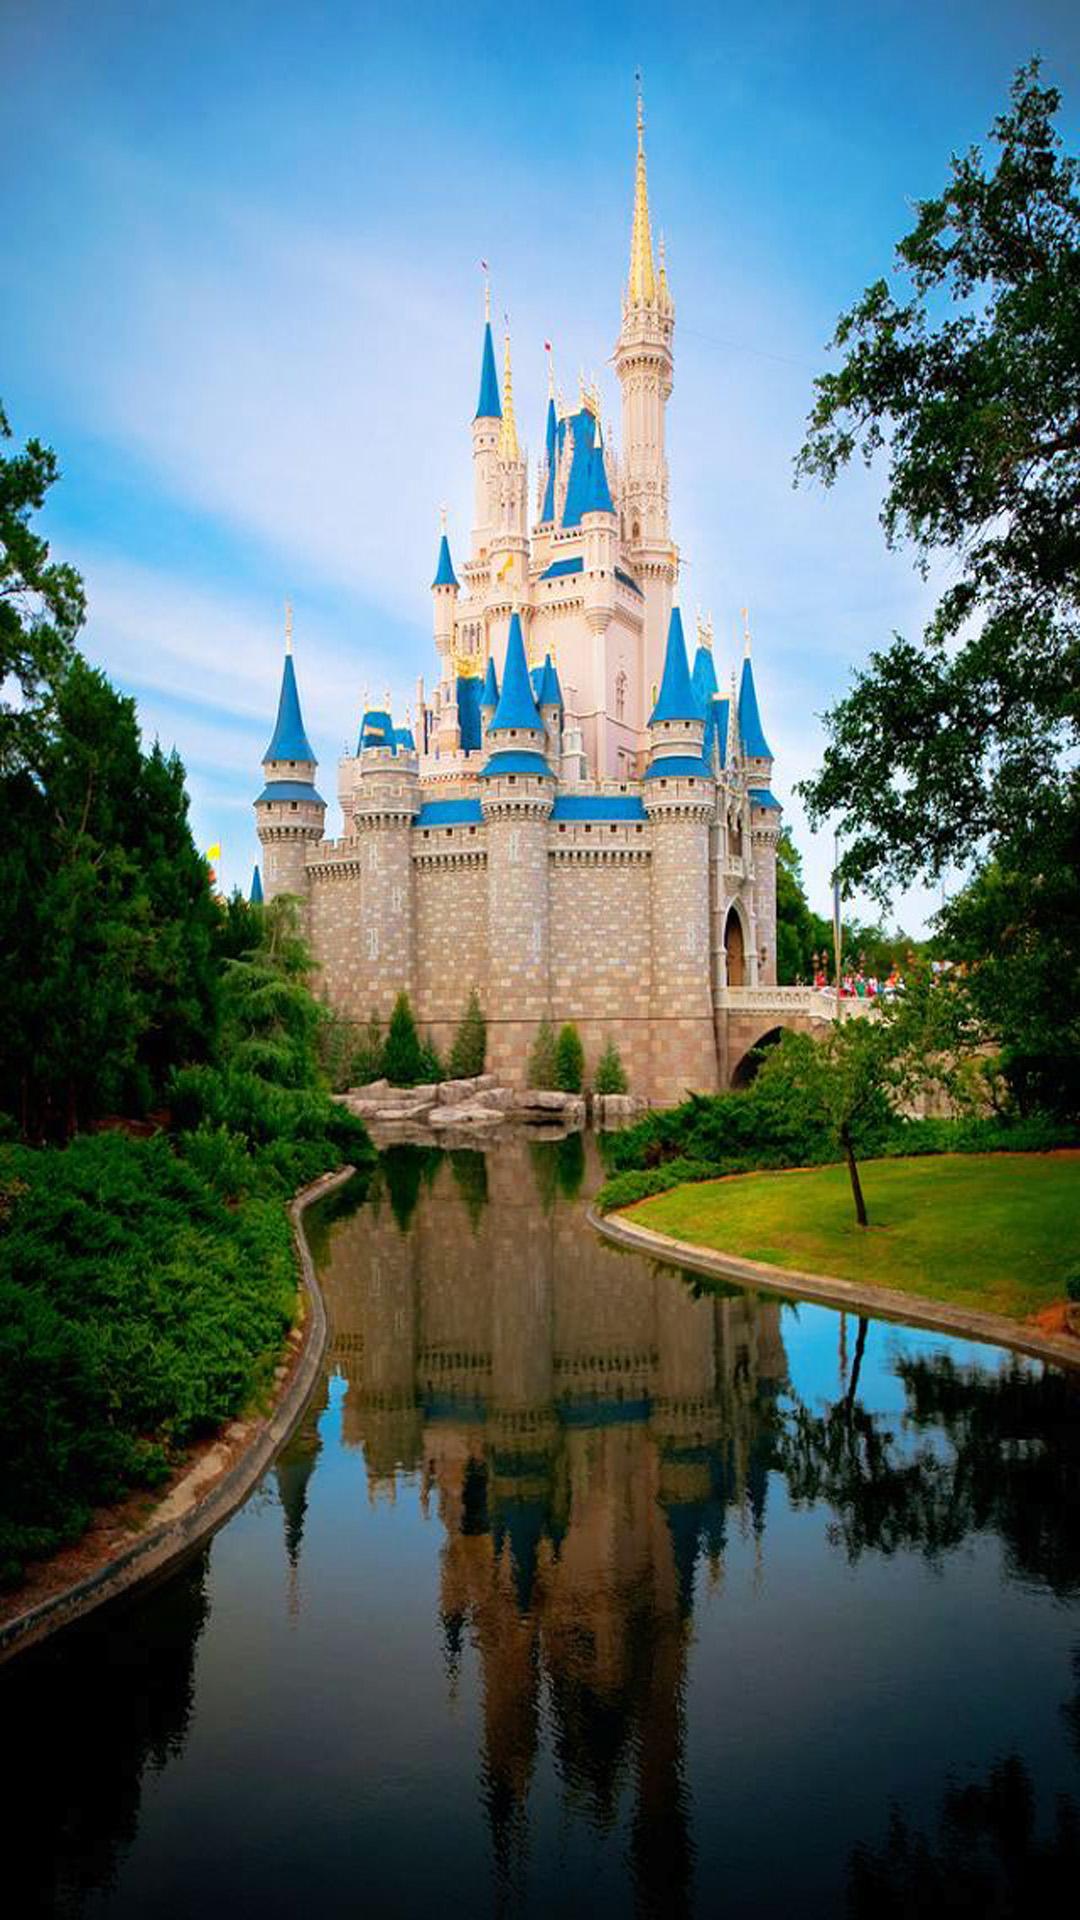 Walt Disney World Iphone Wallpaper Free Download Disney Iphone Backgrounds Pixelstalk Net